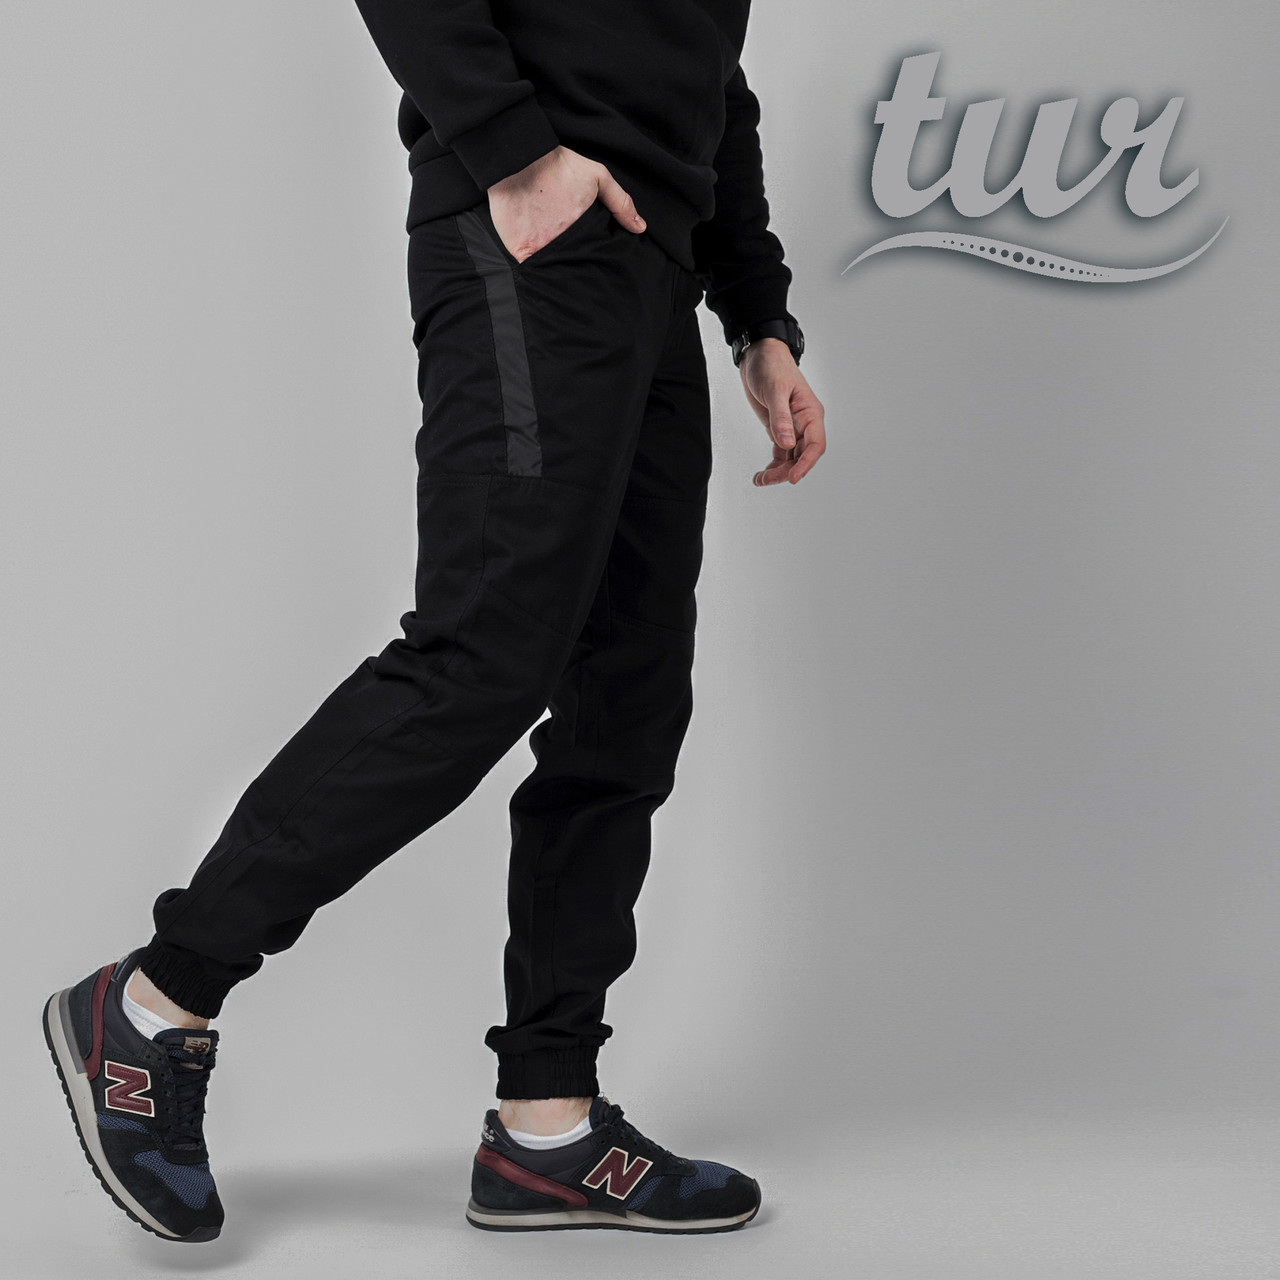 Штаны джоггеры мужские черные от бренда ТУР  Мэд Макс (Mad Max) размер XL, XXL